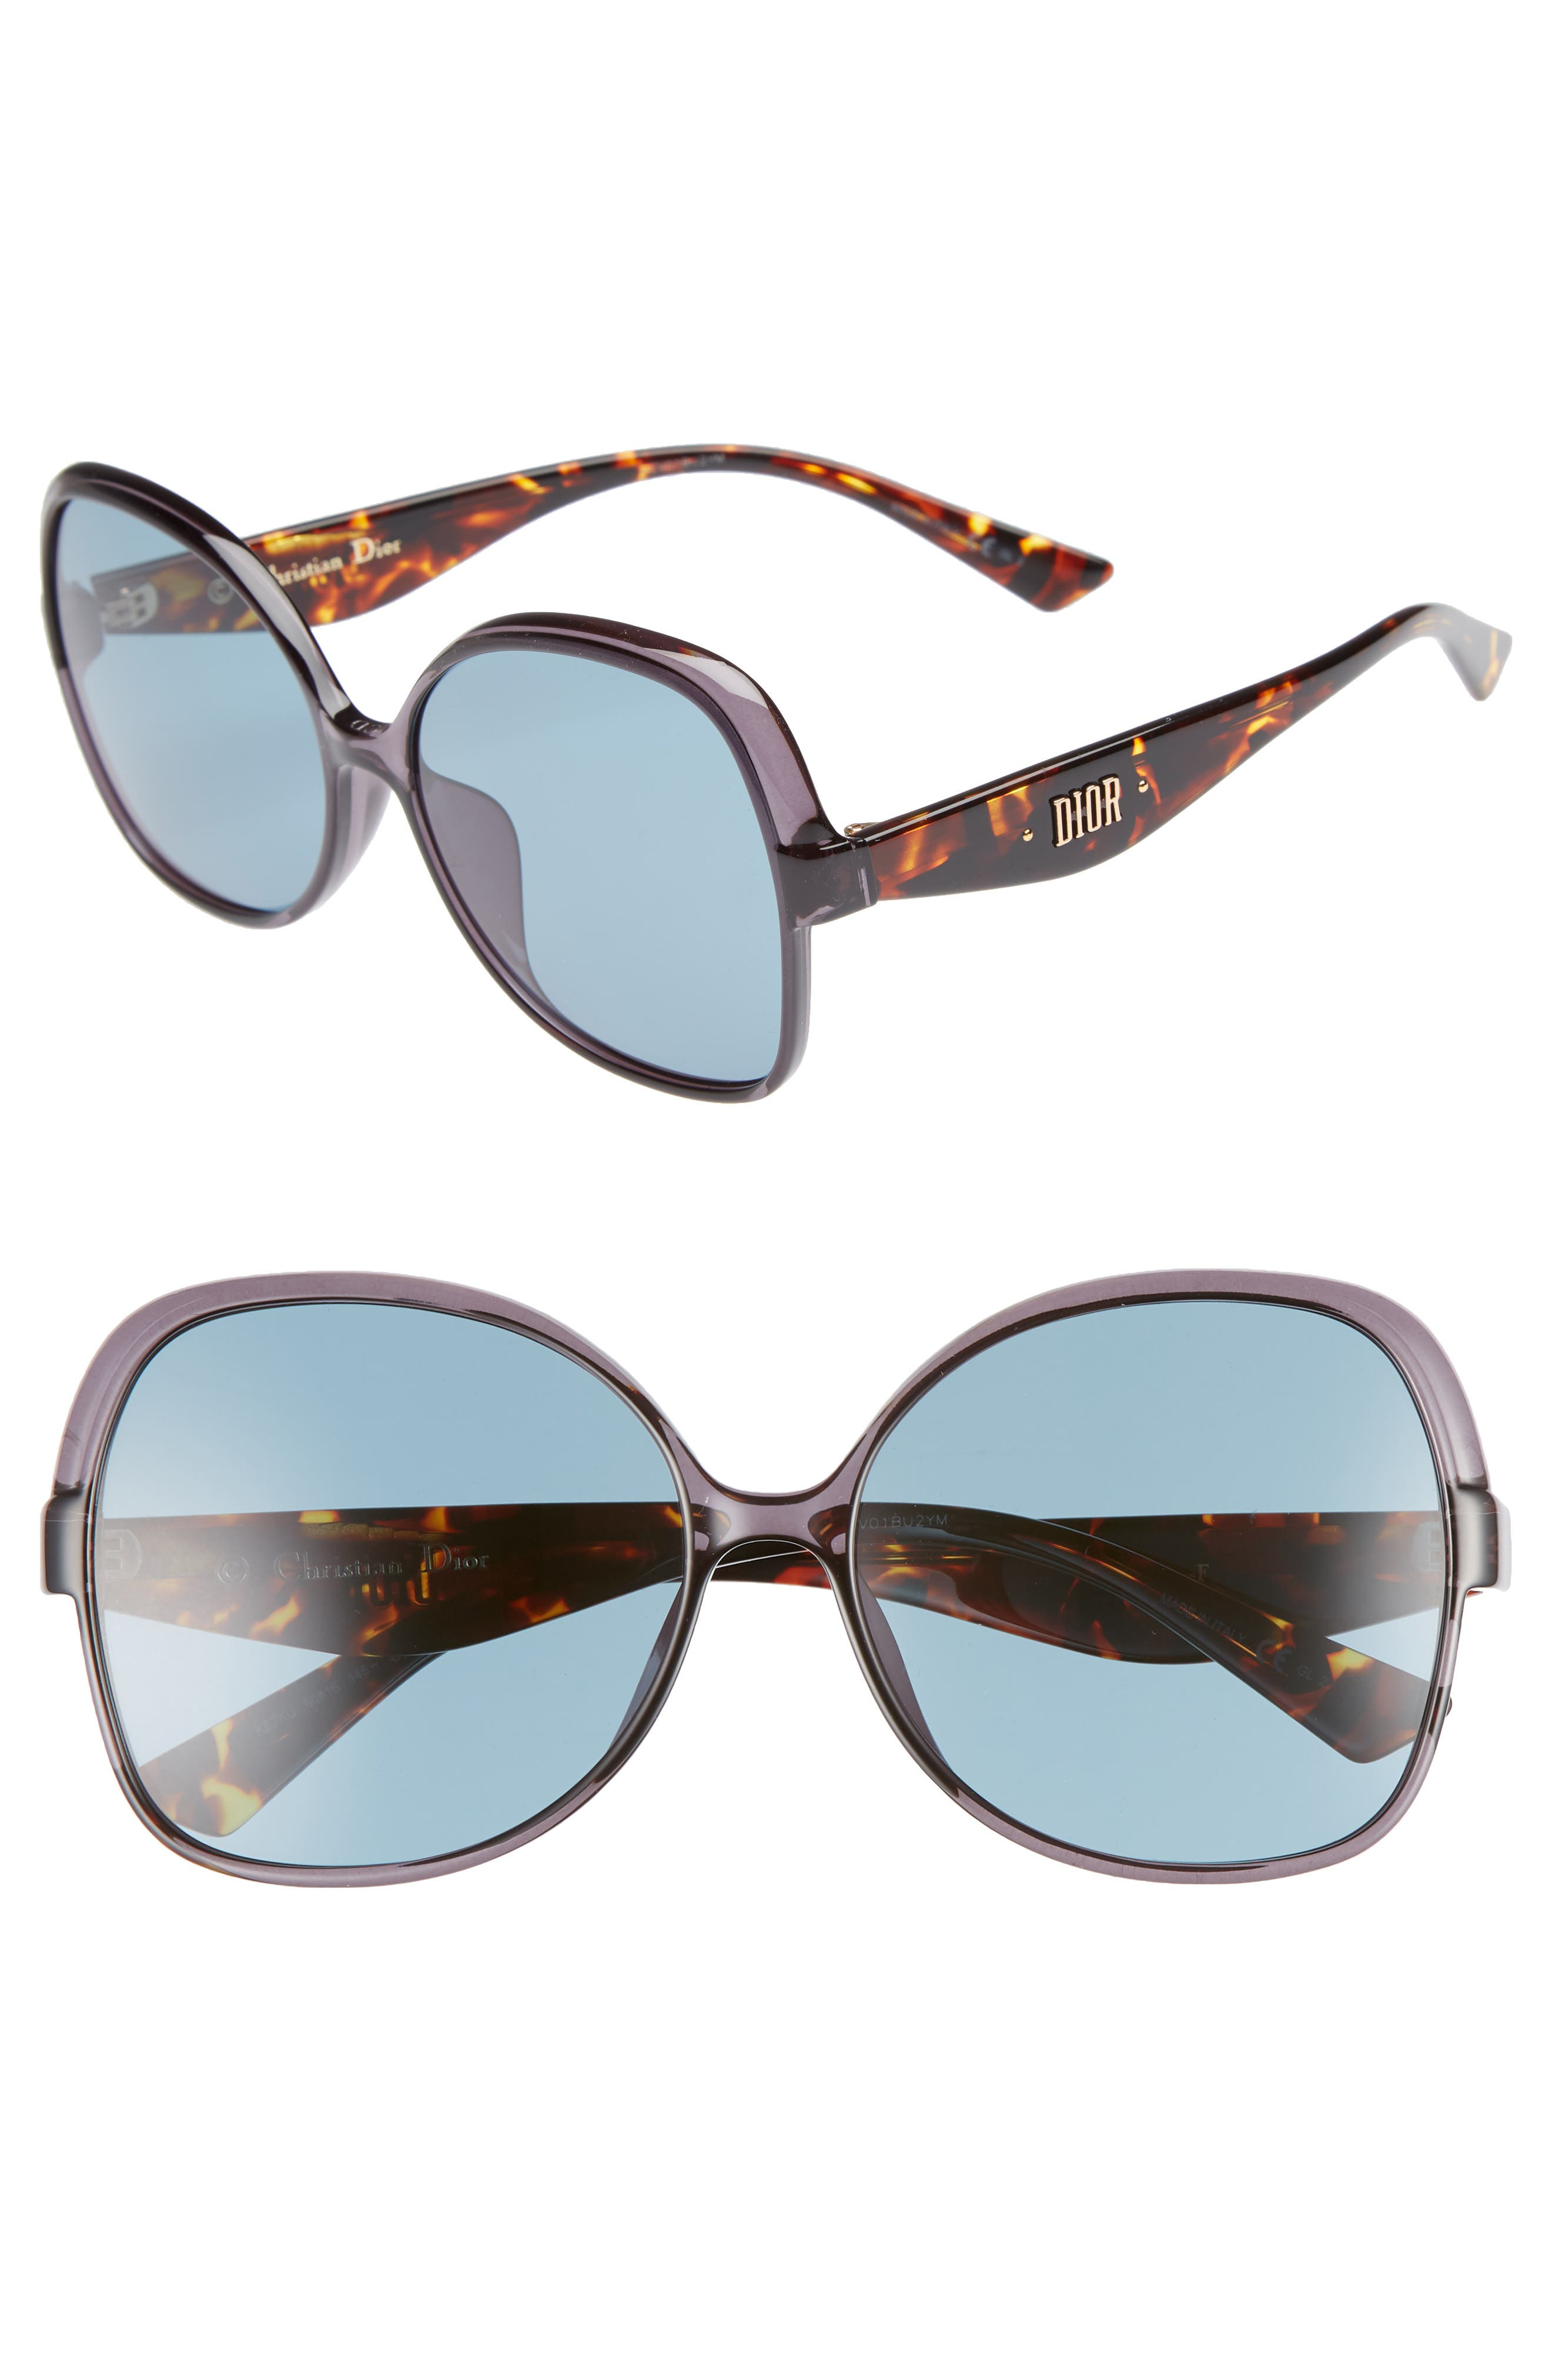 Dior Nuance F 60mm Sunglasses